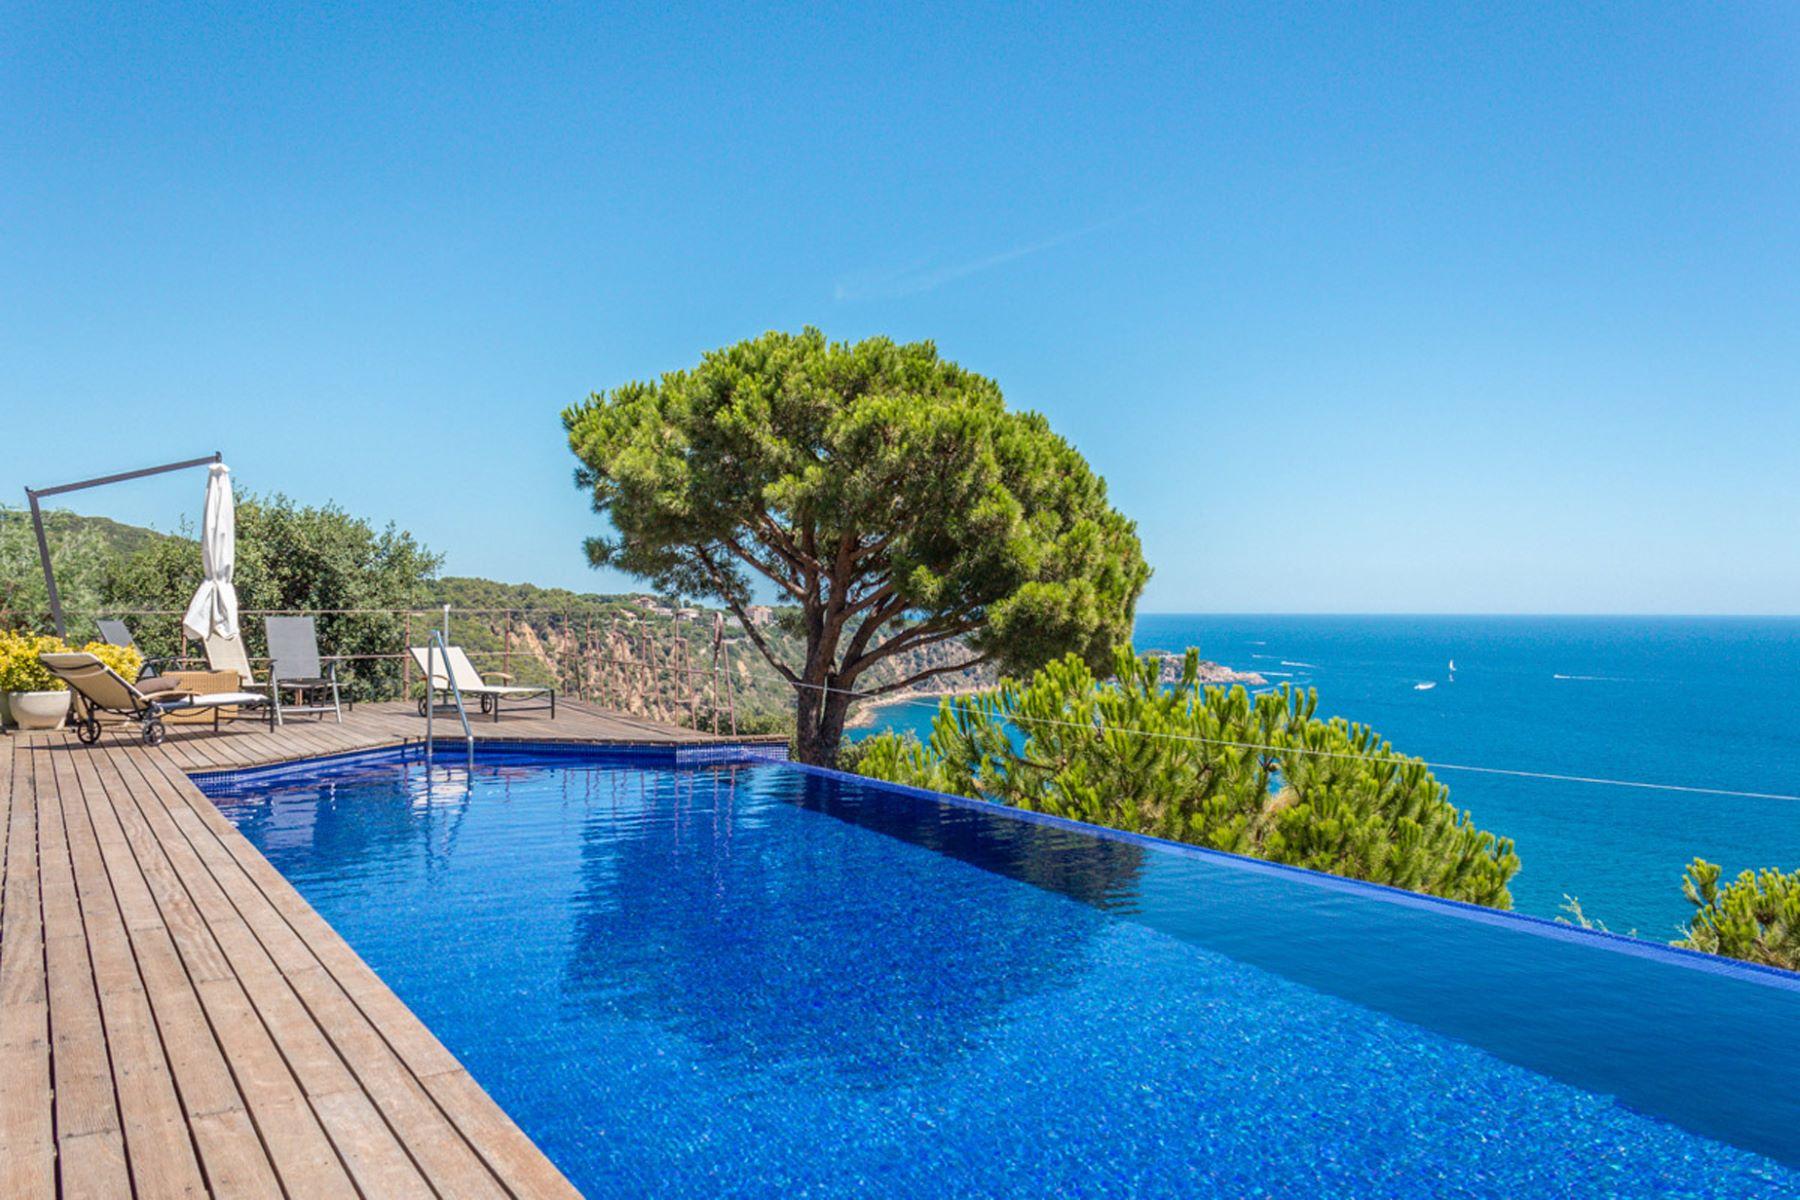 Single Family Home for Sale at Extraordinary villa with stunning Mediterranean views Sant Feliu De Guixols, Costa Brava, 17220 Spain